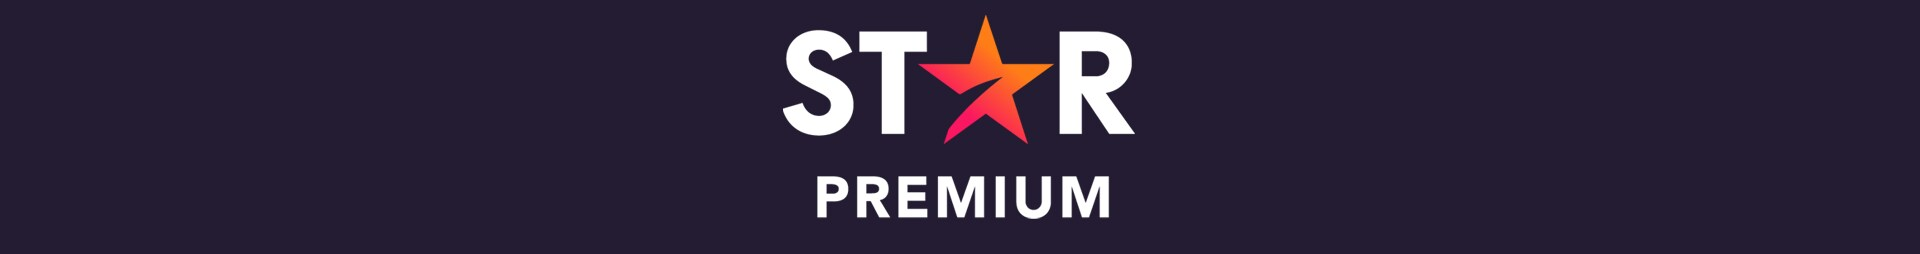 Top_StarPremium_HP_lançamento